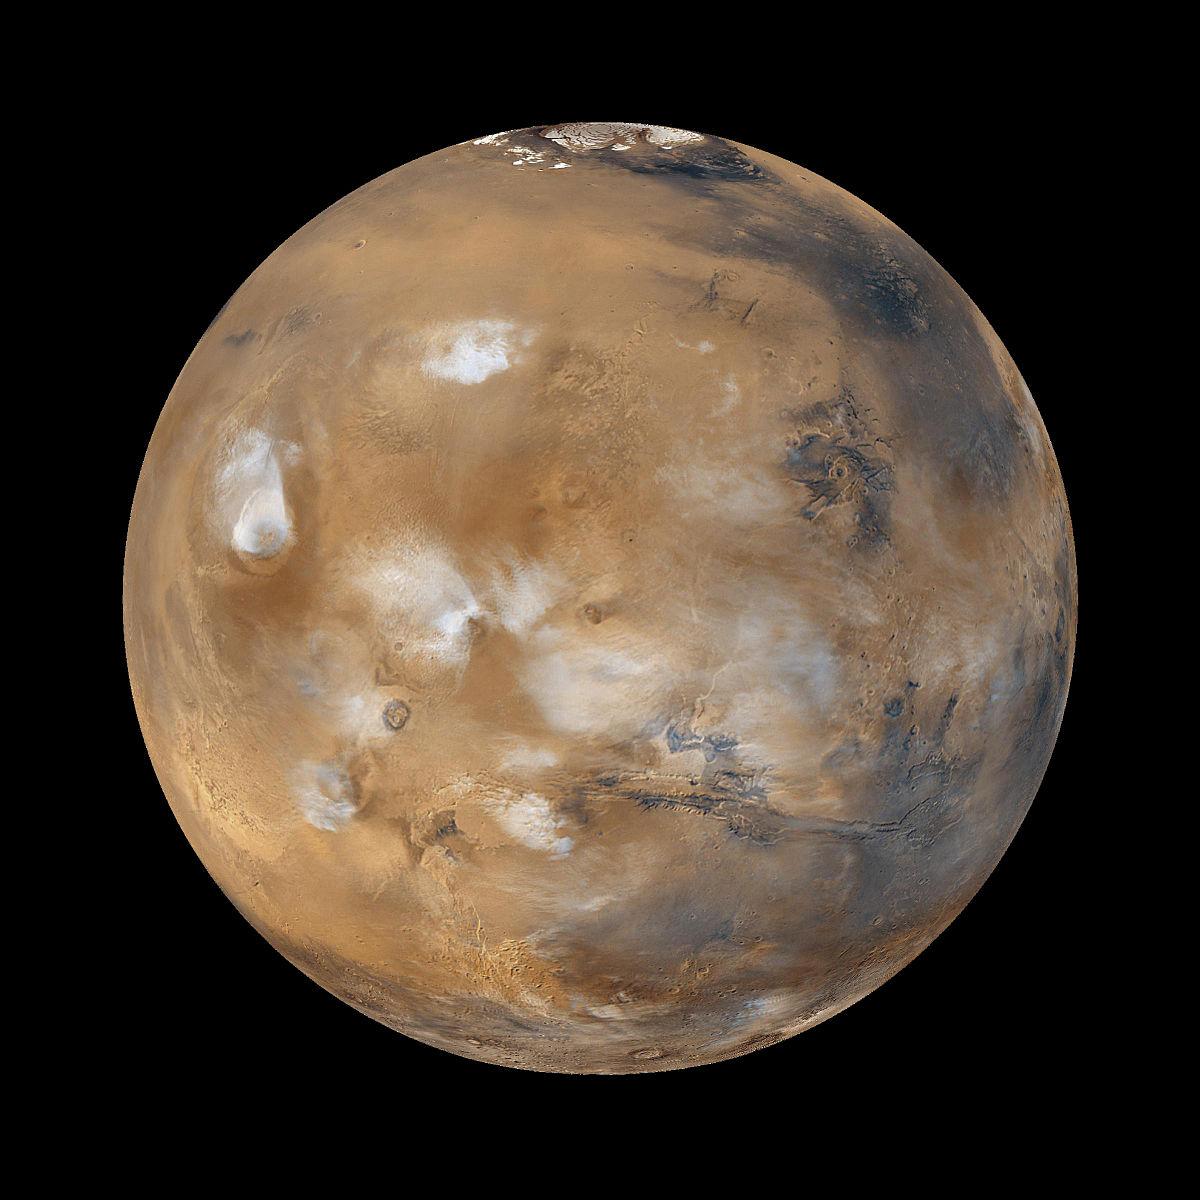 Mars Planet Wikipedia